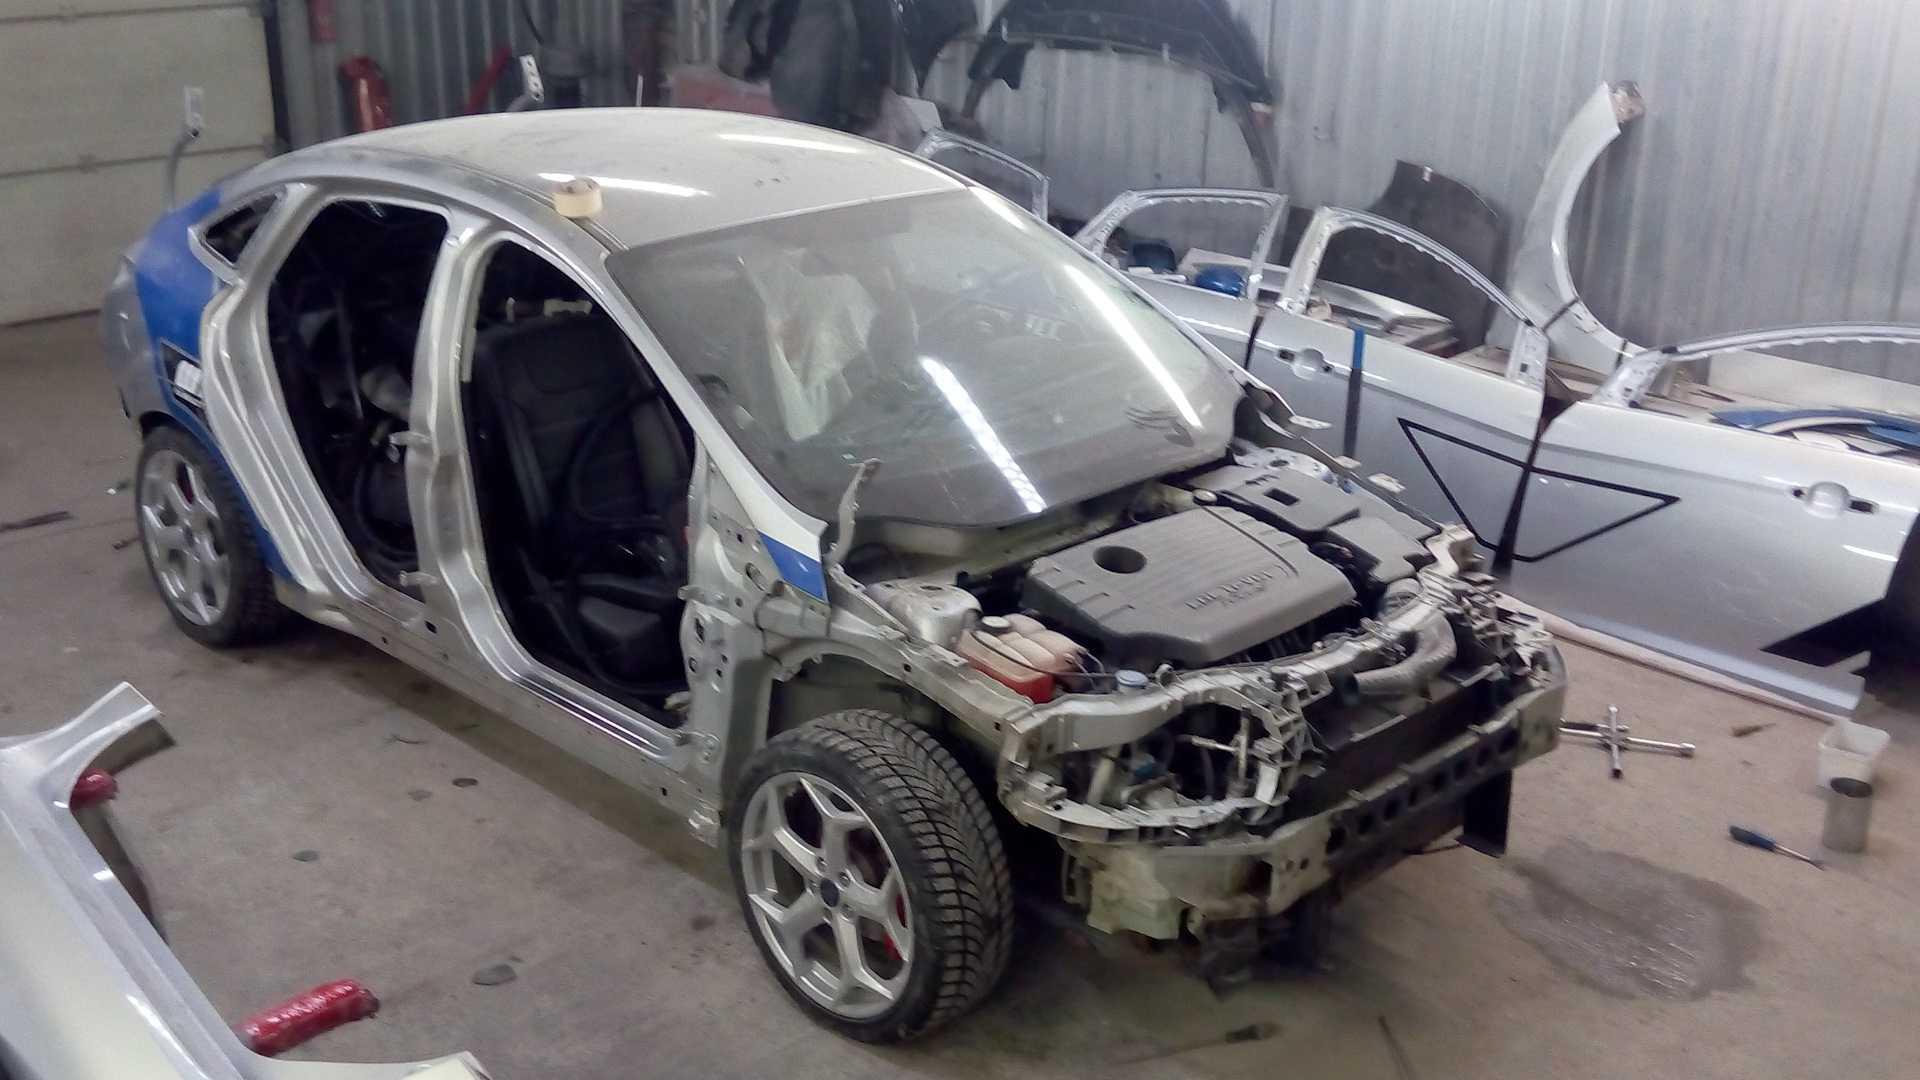 Регулировка фар на форд фокус 1, 2, 3 своими руками: рестайлинг и дорестайлинг